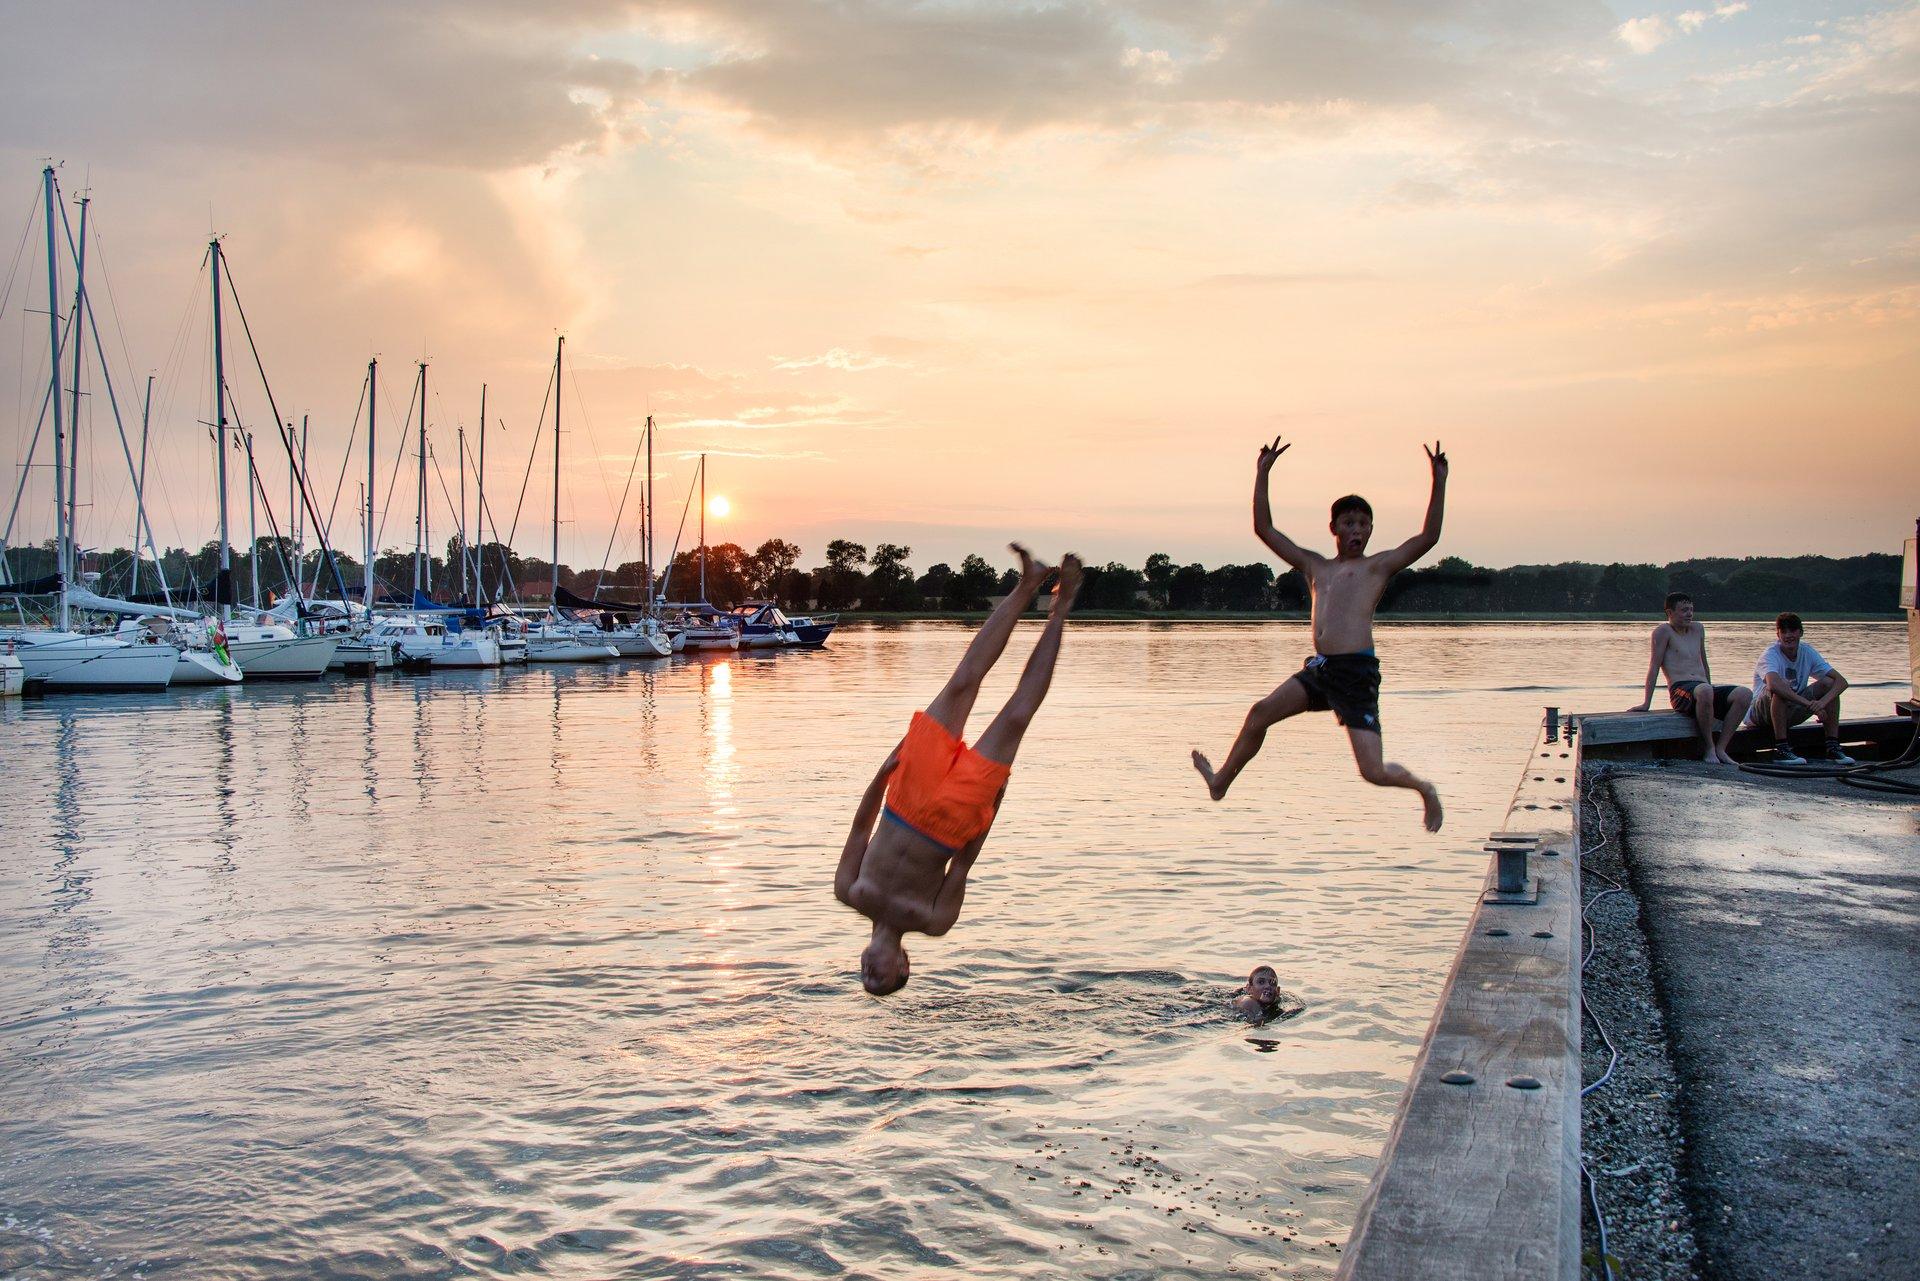 Stadig flere danske destinationsselskaber kommer med i brancheforeningen Danske Destinationer, senest Wonderful Copenhagen. Her er det fra havnen i Præstø, pressefoto for VisitDenmark: Thomas Rousing.